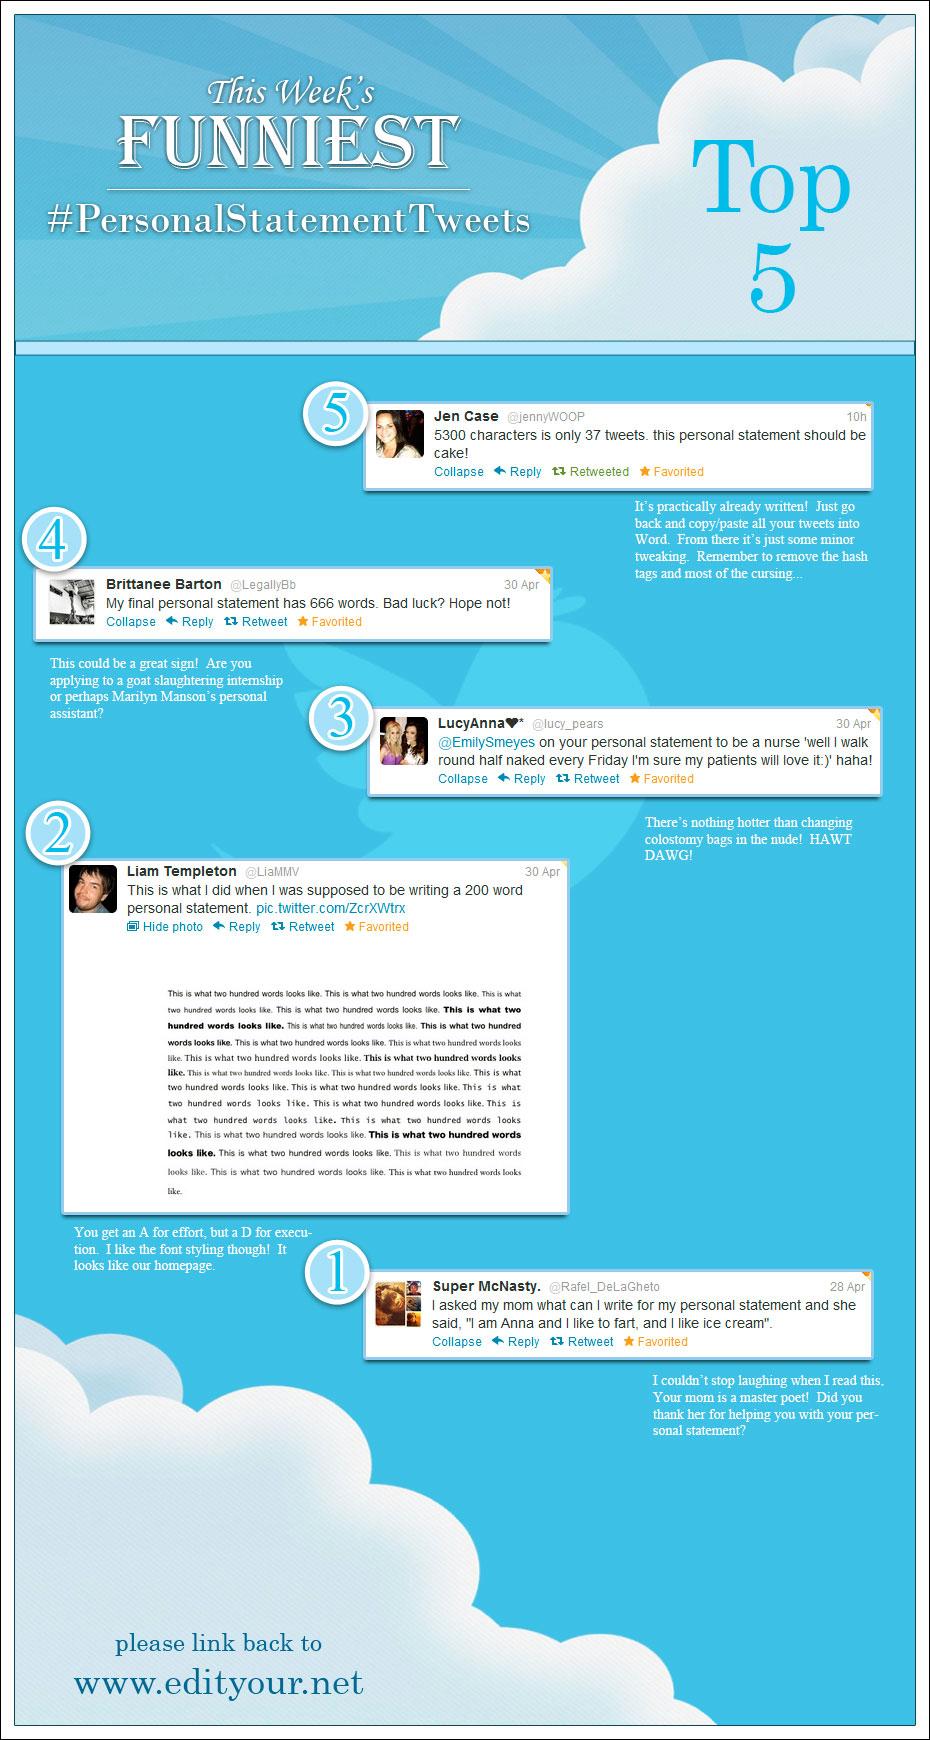 This Week's Top 5 Funniest Personal Statement Tweets